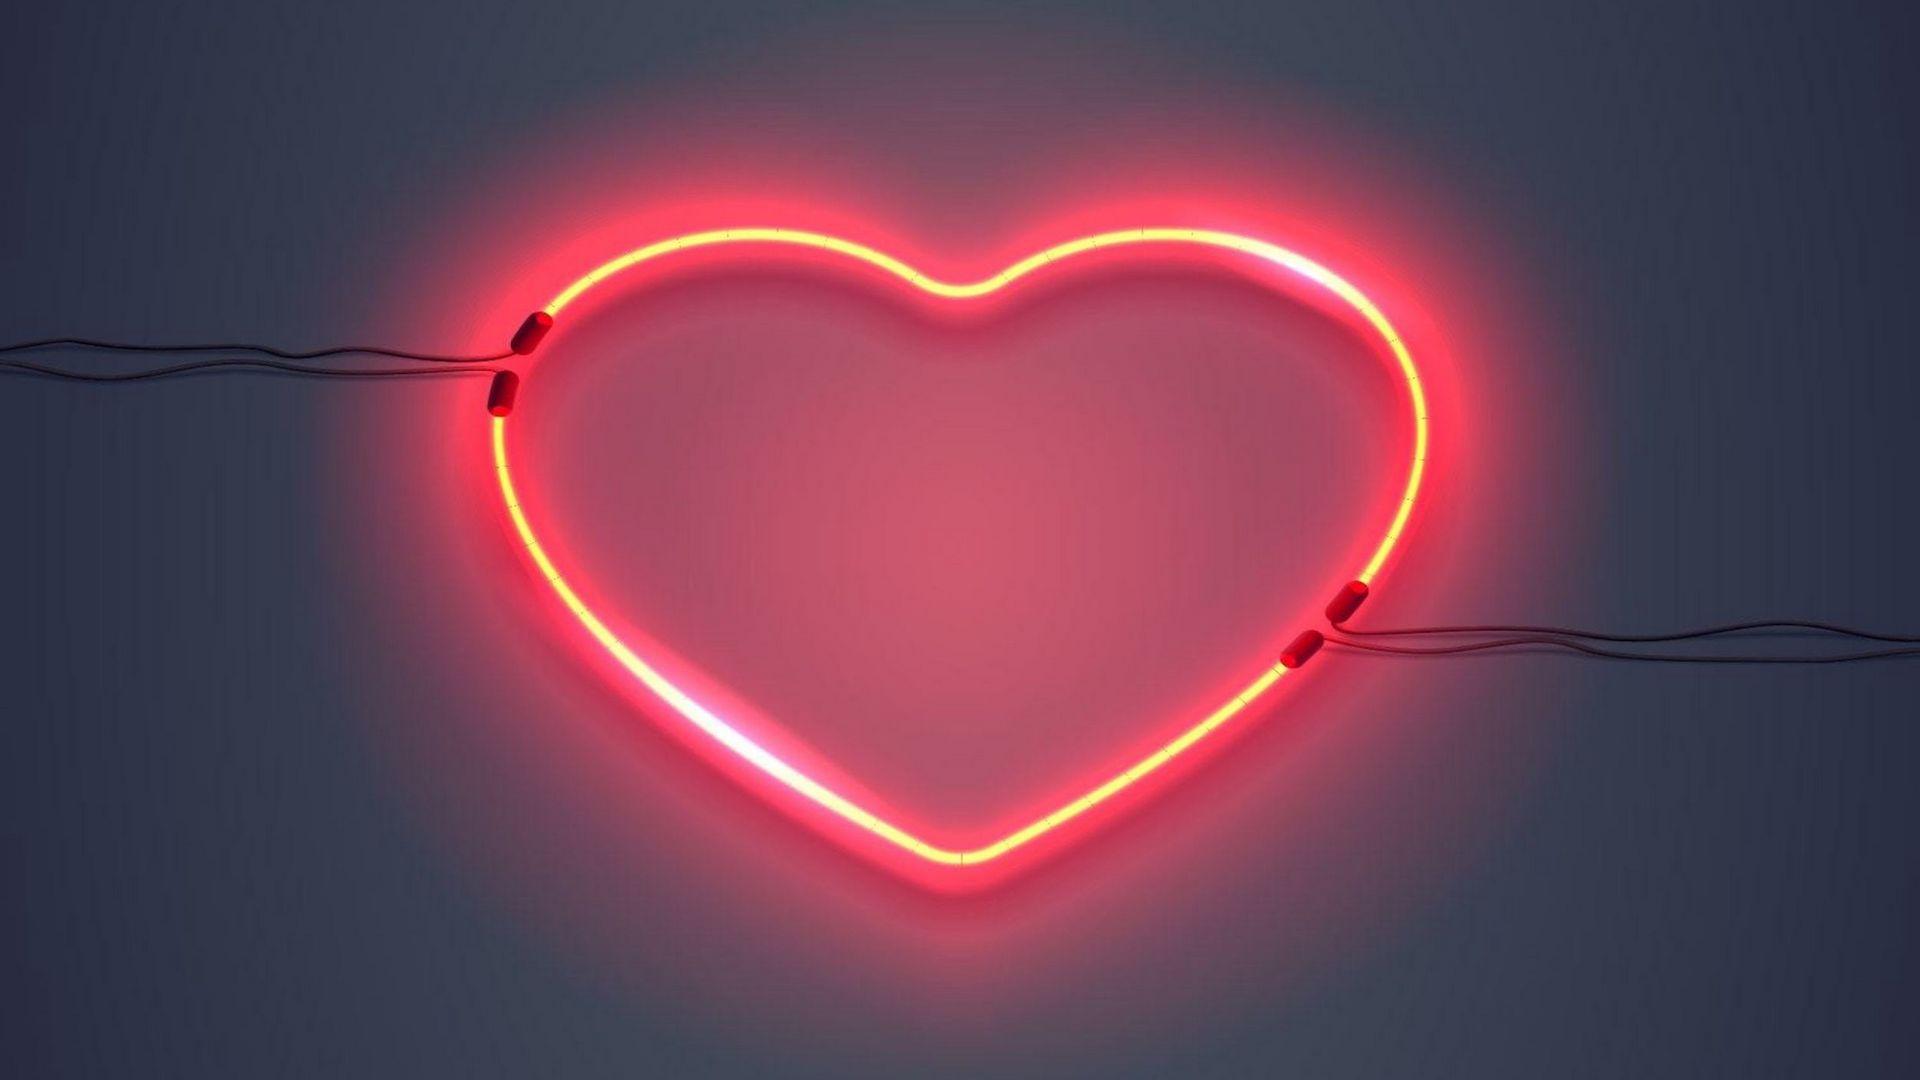 Heart Wallpaper hd